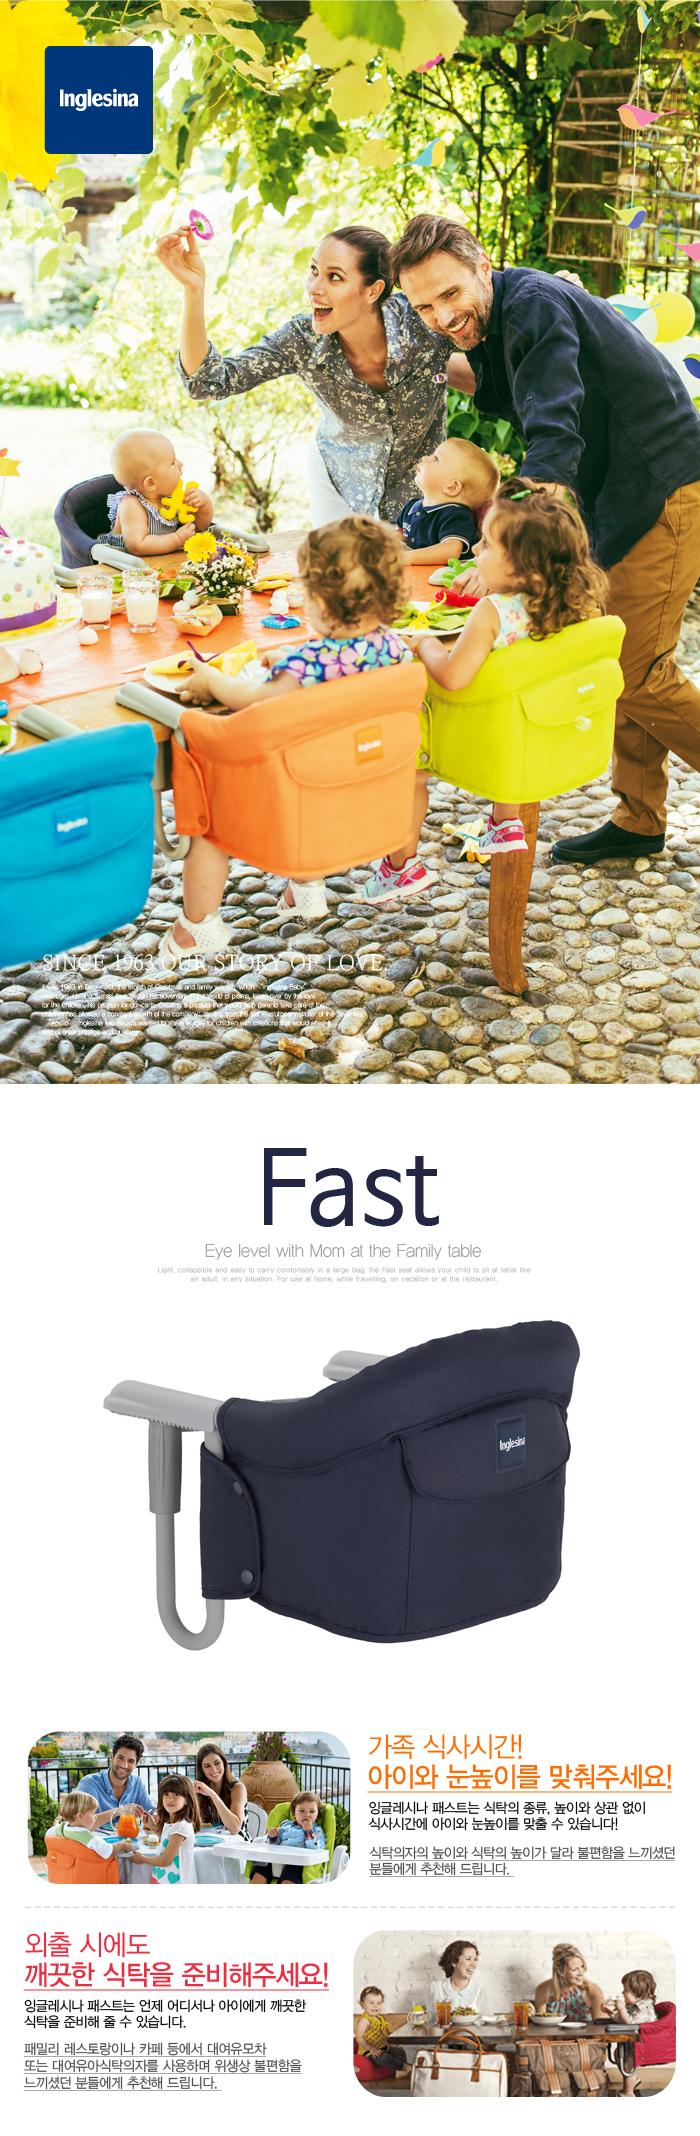 fast_001.jpg